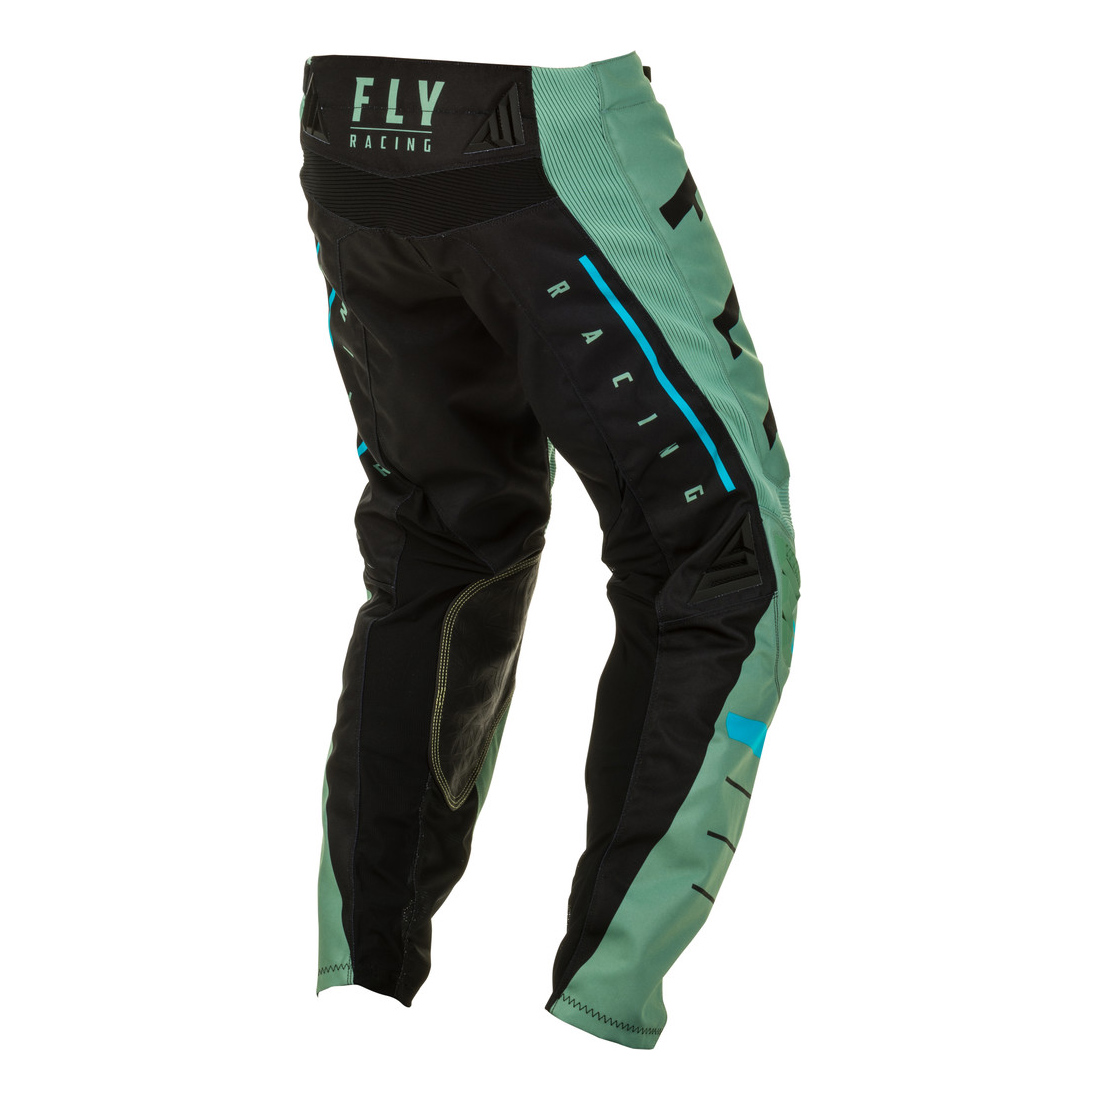 FLY YOUTH KINETIC K120 2020 PANTS